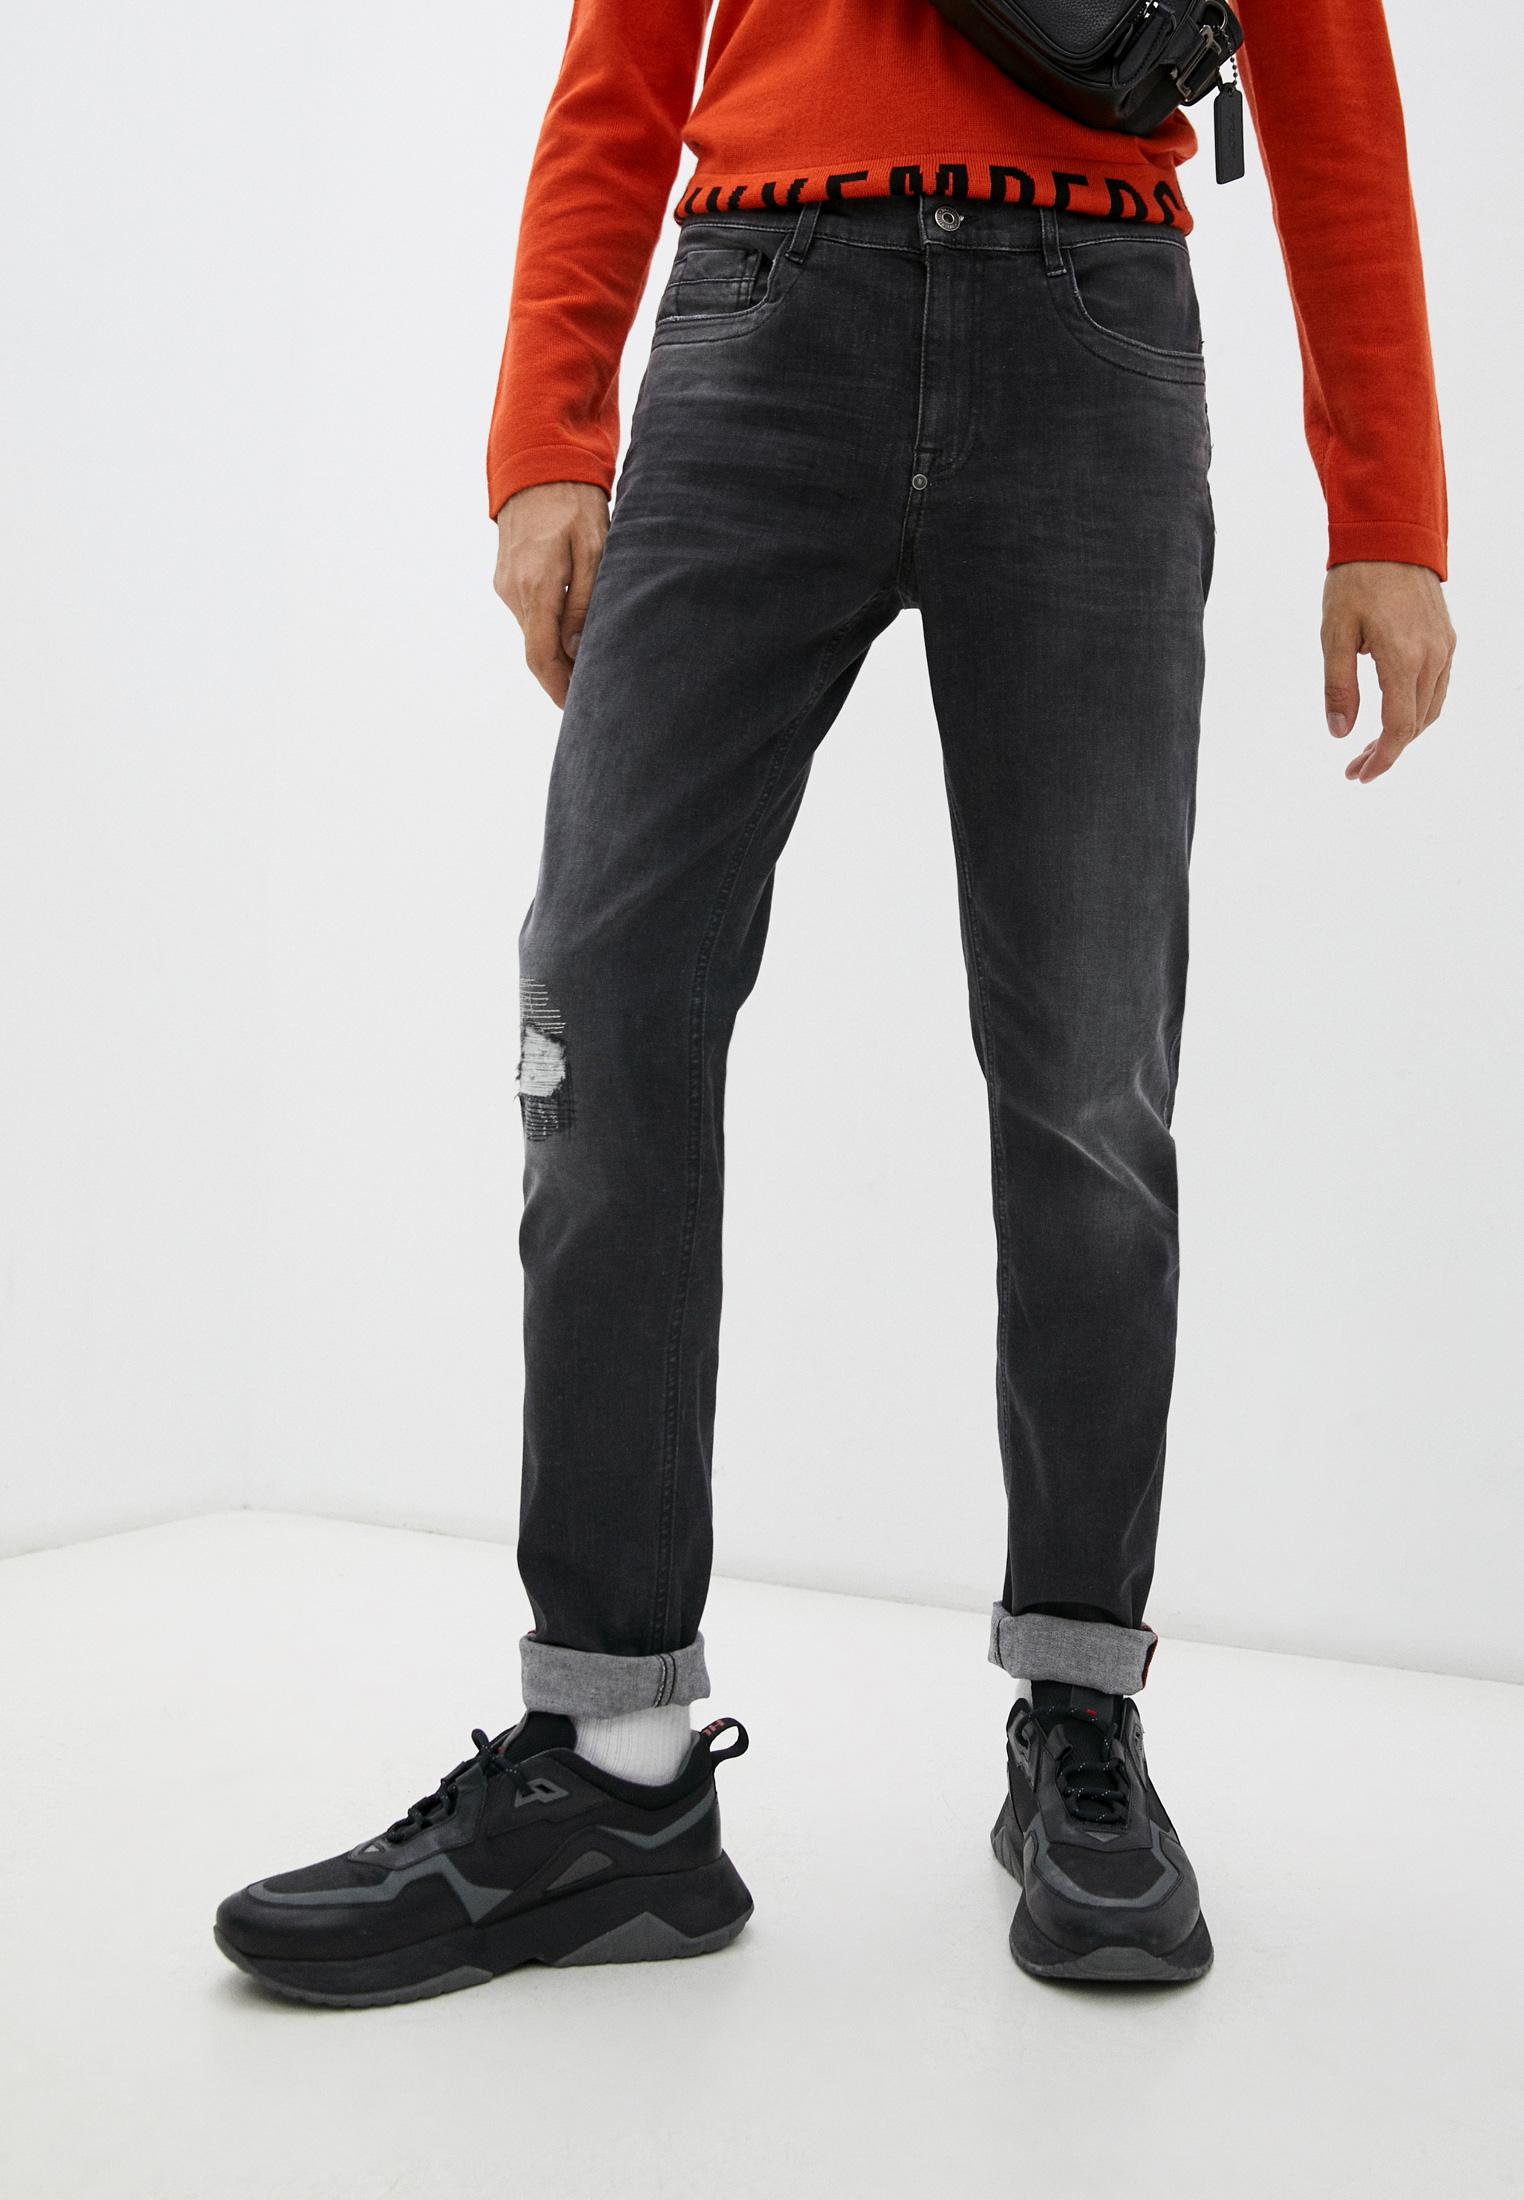 Мужские зауженные джинсы Bikkembergs (Биккембергс) C Q 101 17 S 3446